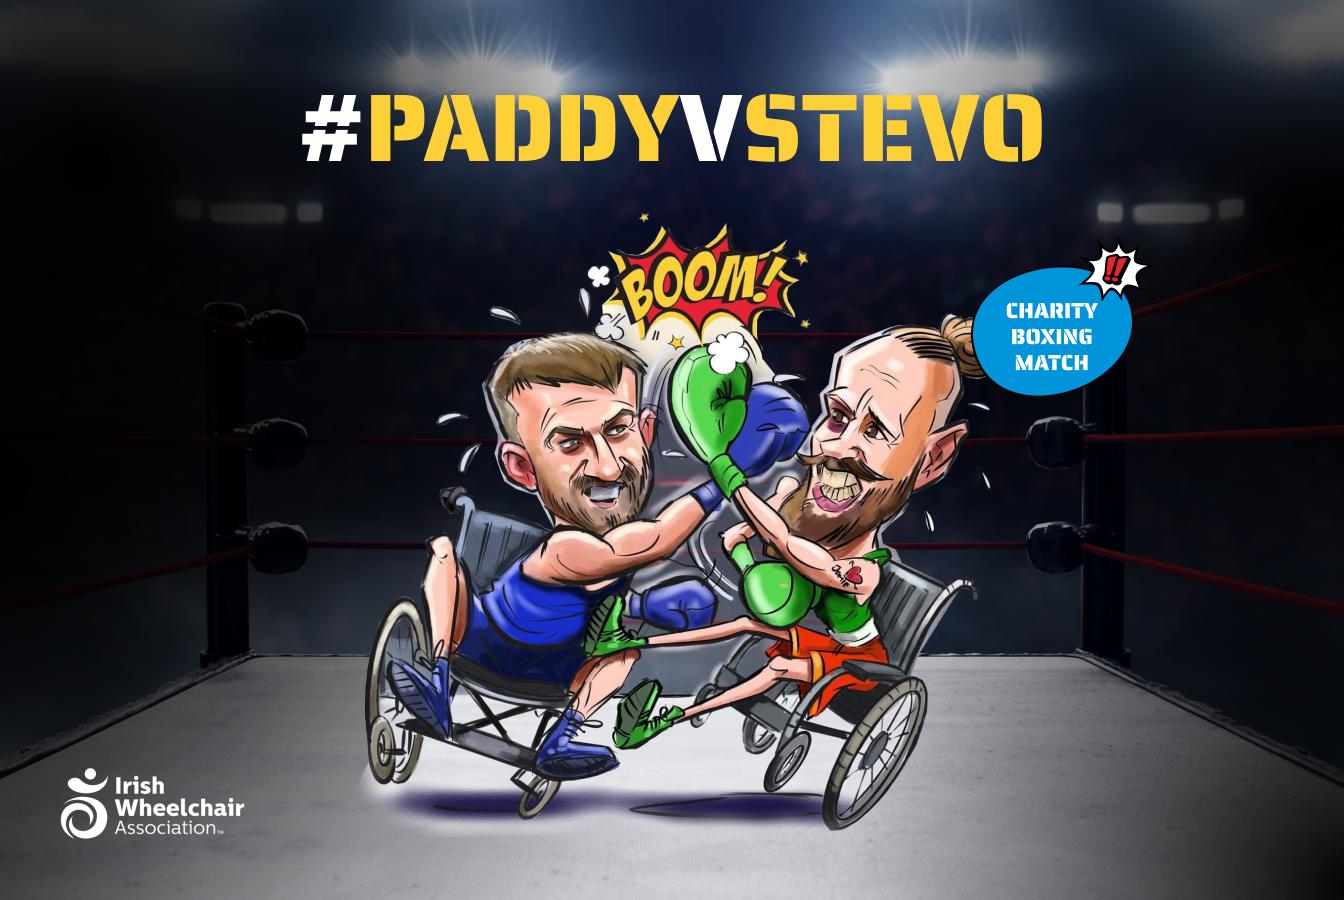 StevoVPaddy Charity Event